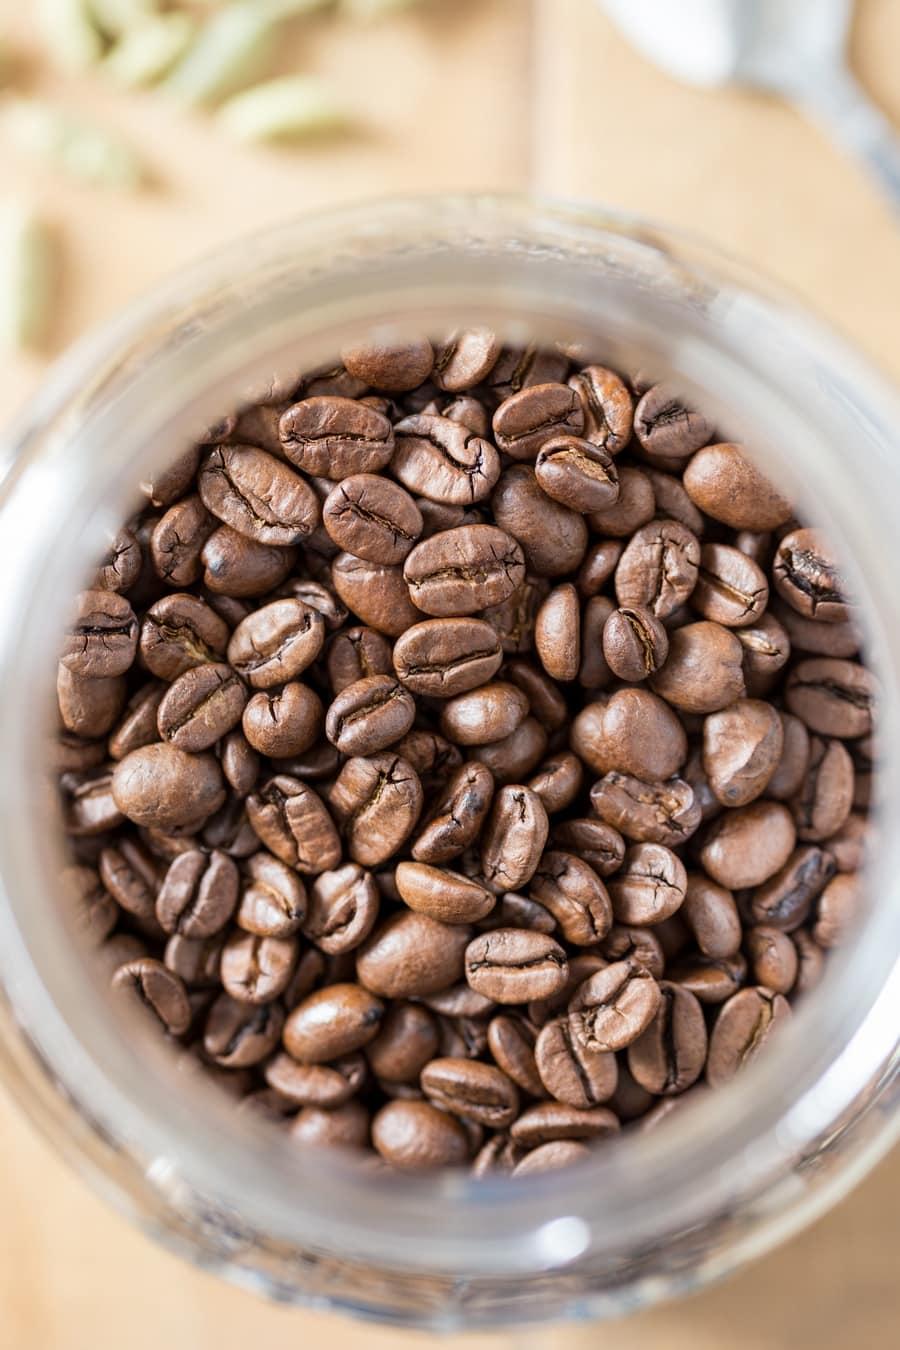 Coffee beans in a mason jar, overhead.